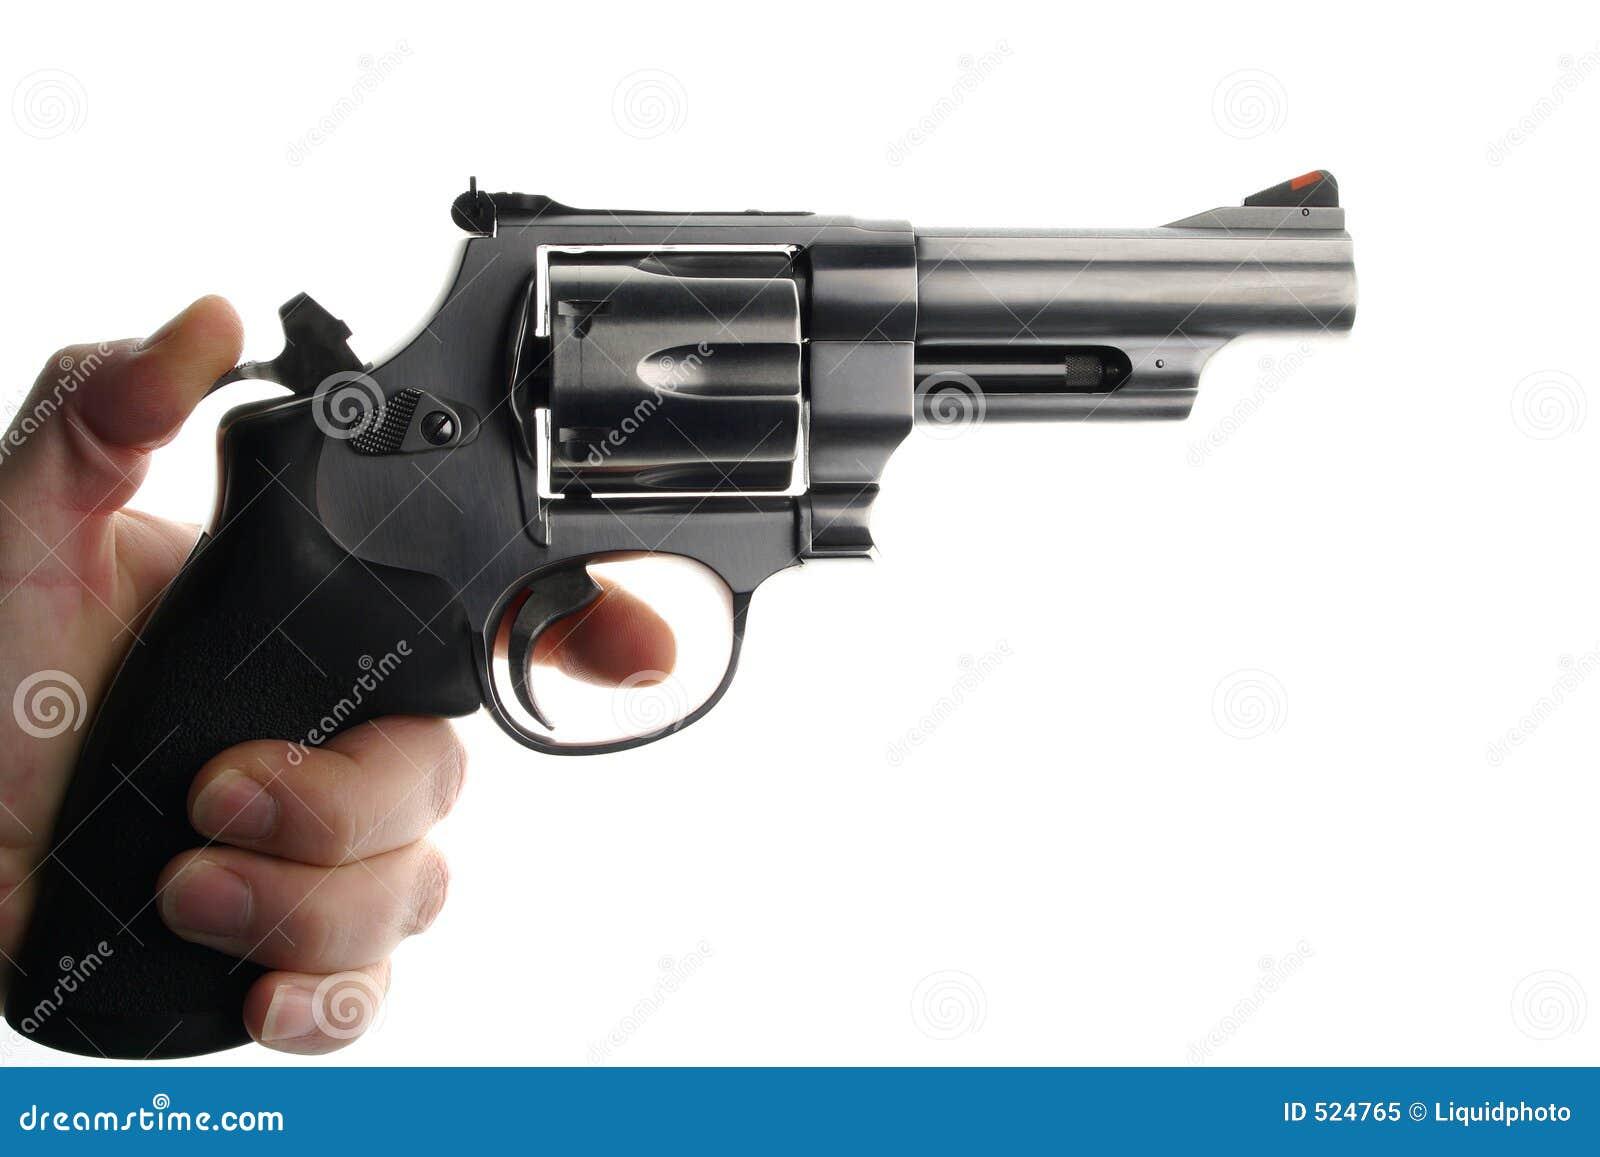 Hand Holding Handgun Or Pistol Royalty Free Stock Photo ...